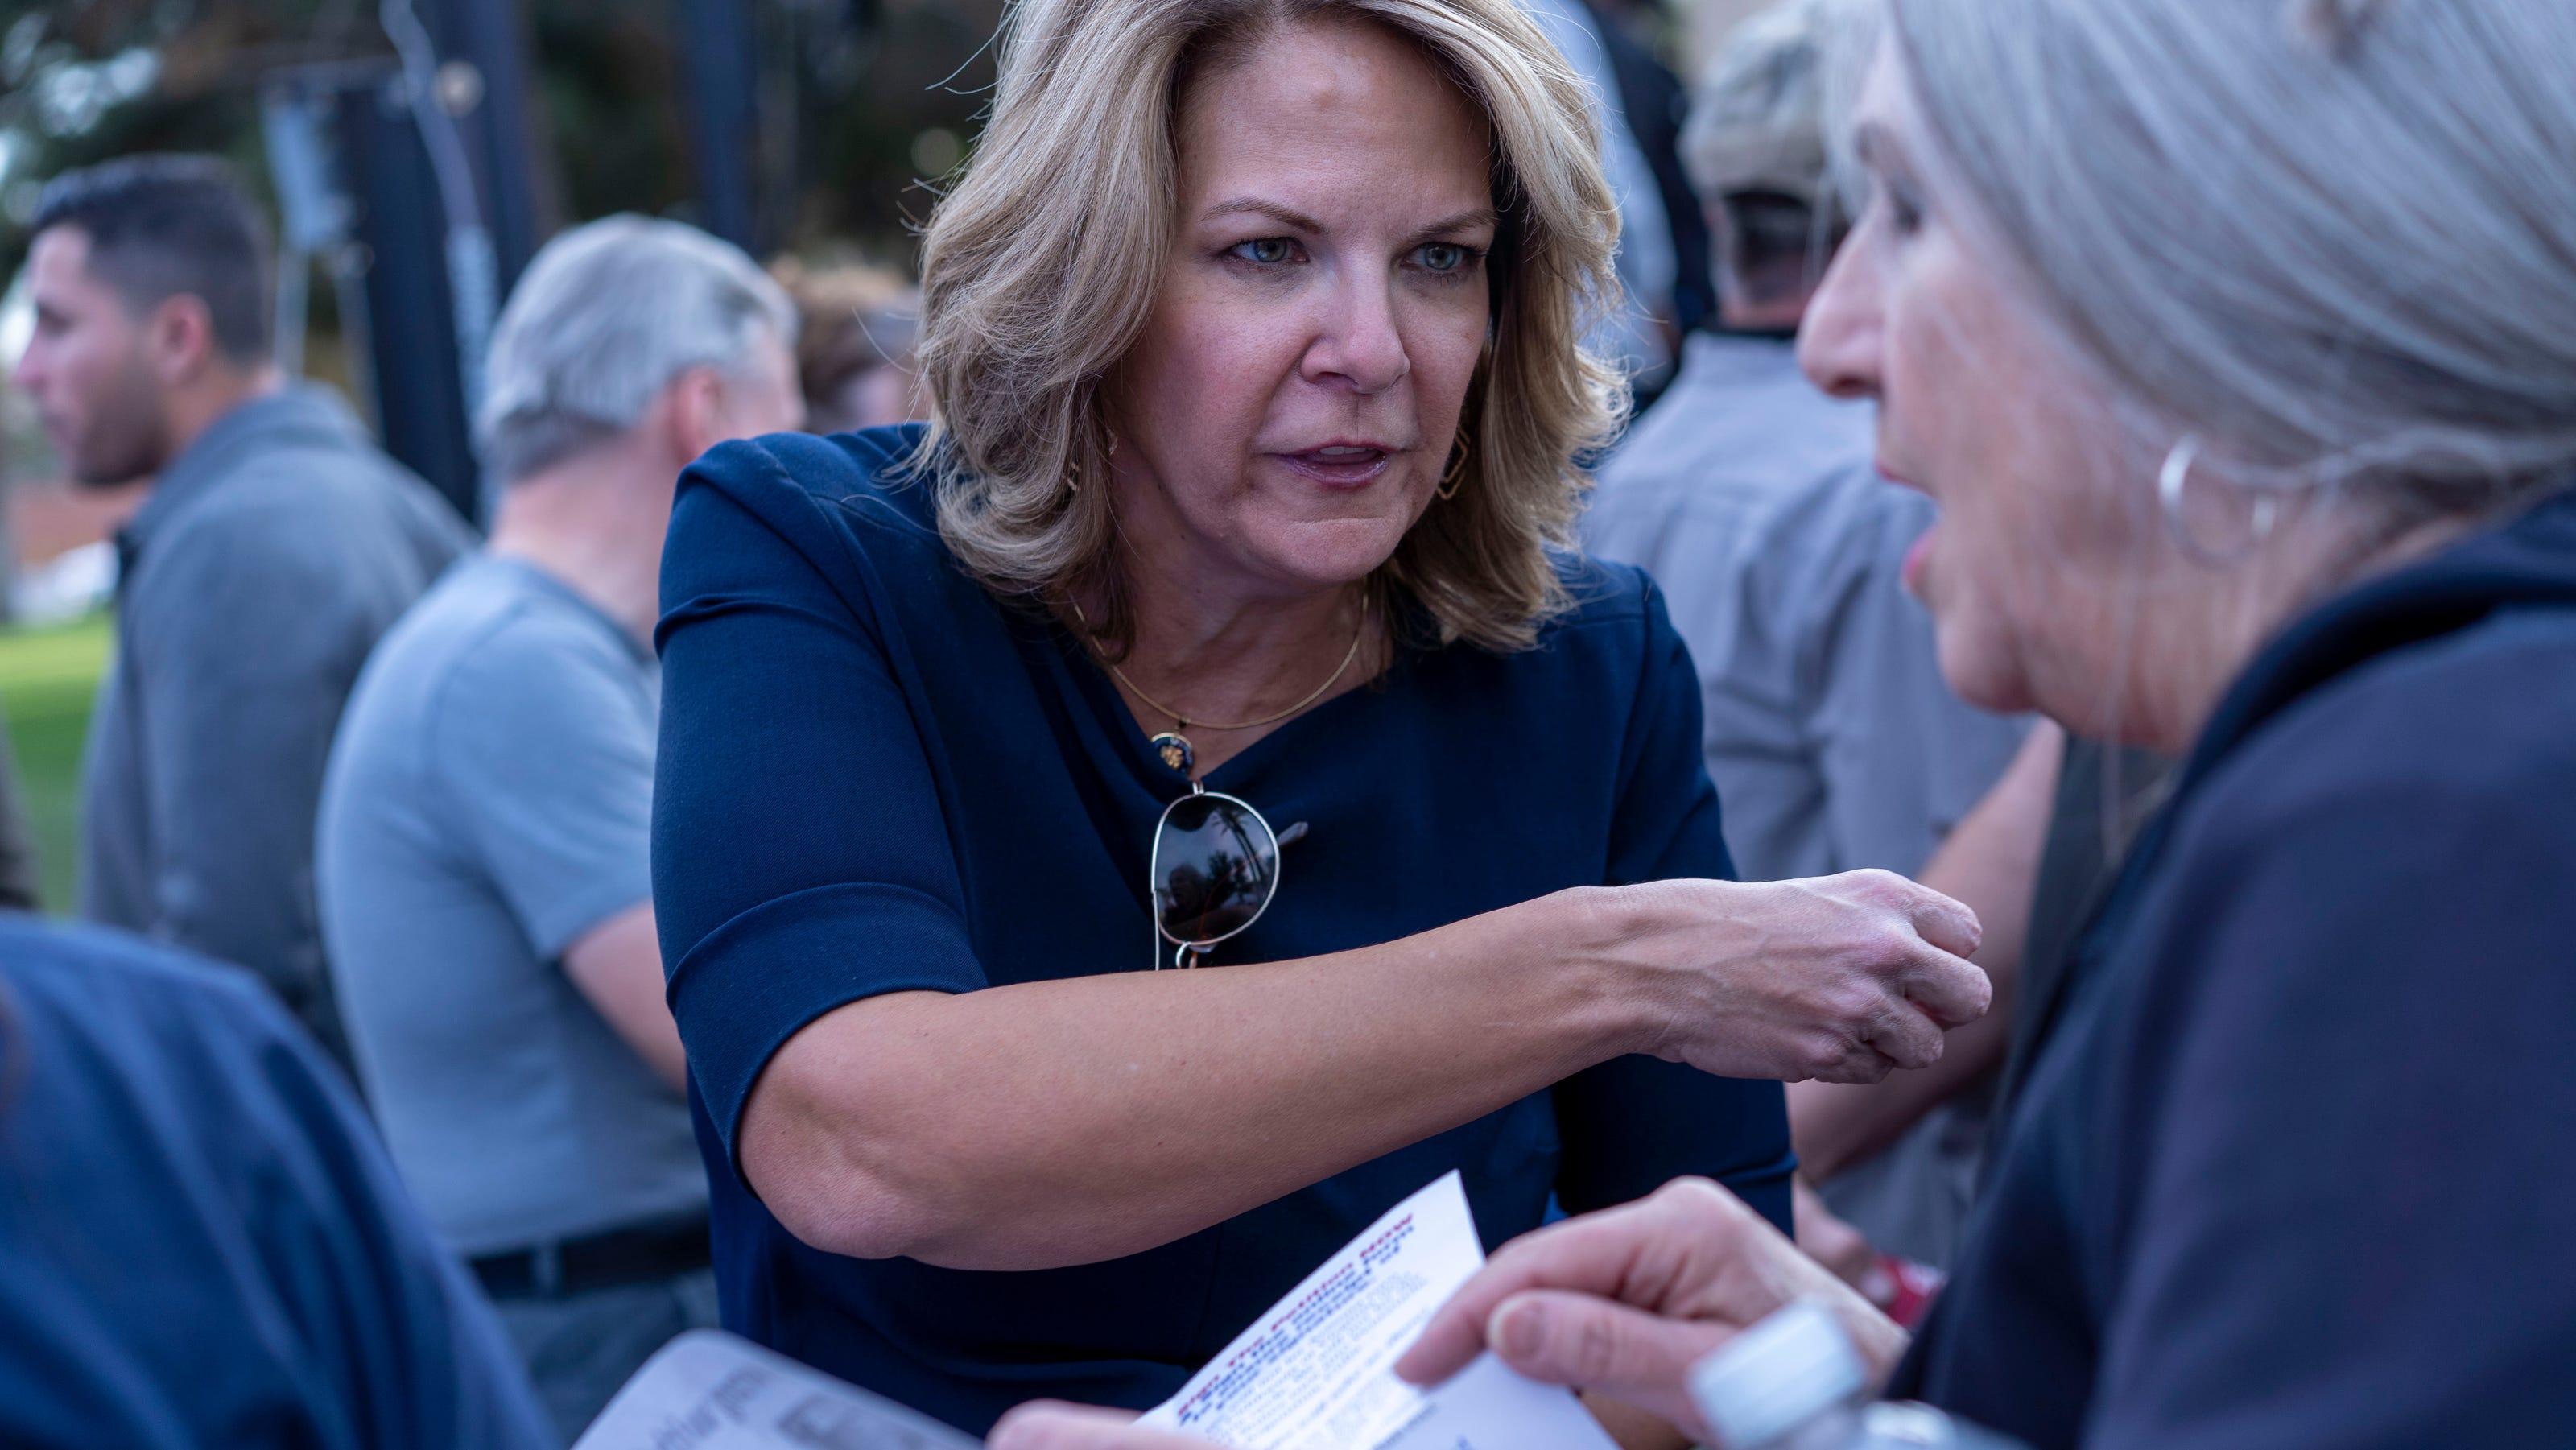 Arizona GOP narrowly reelects Chairwoman Kelli Ward, a Trump loyalist who spread false election fraud claims